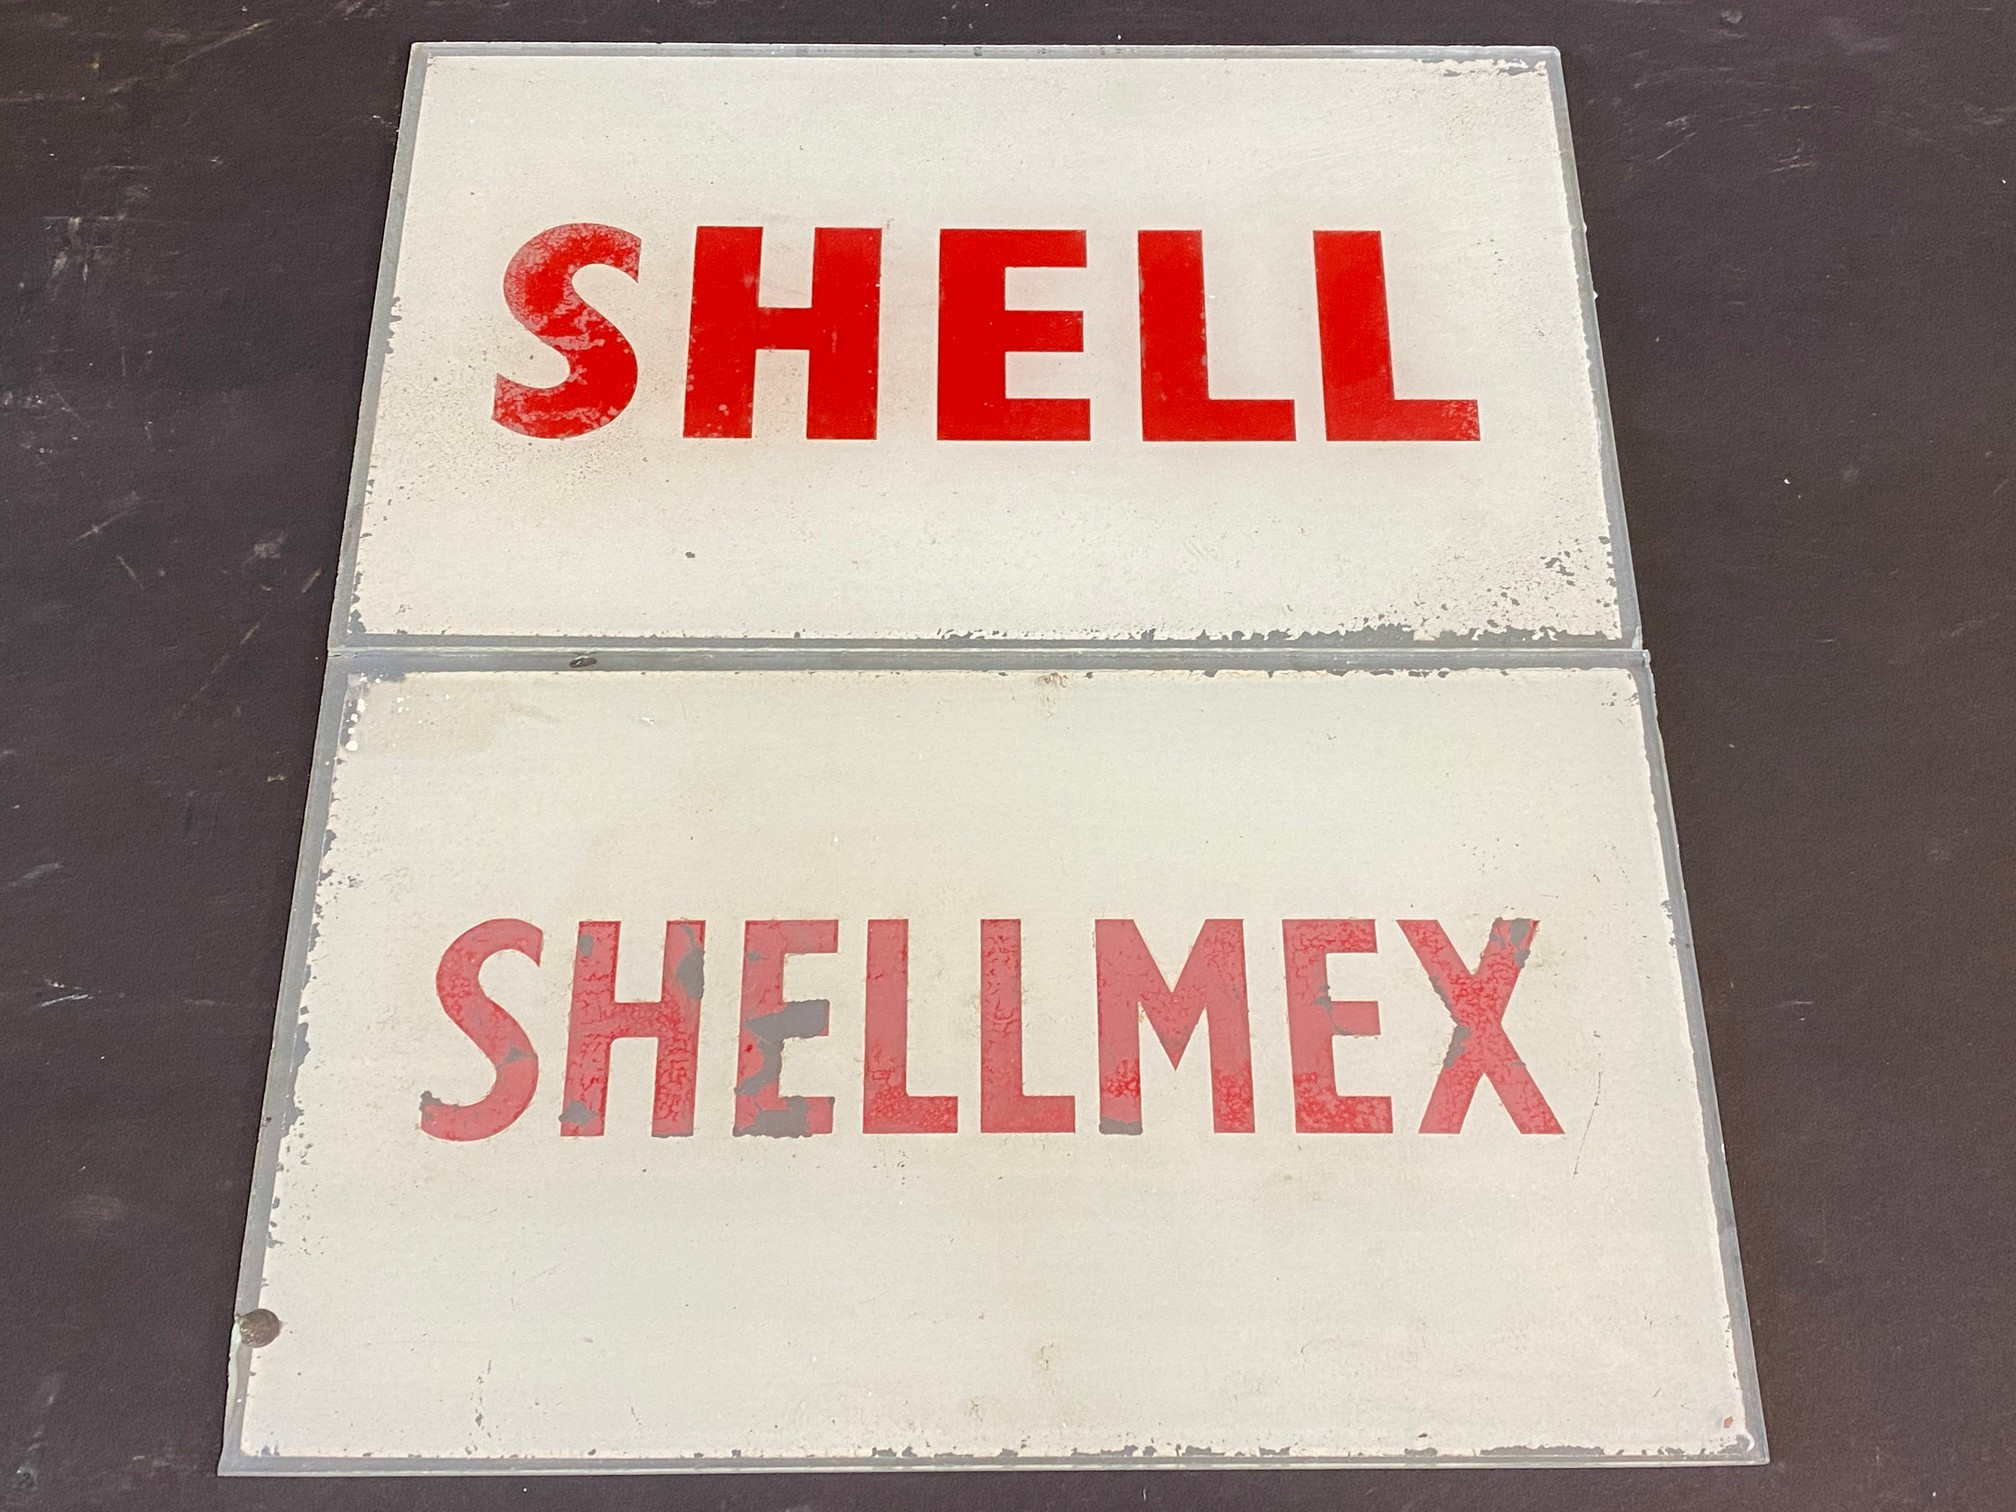 "A Shell glass petrol pump brand insert plus a second for Shellmex, both 8 1/2 x 5""."